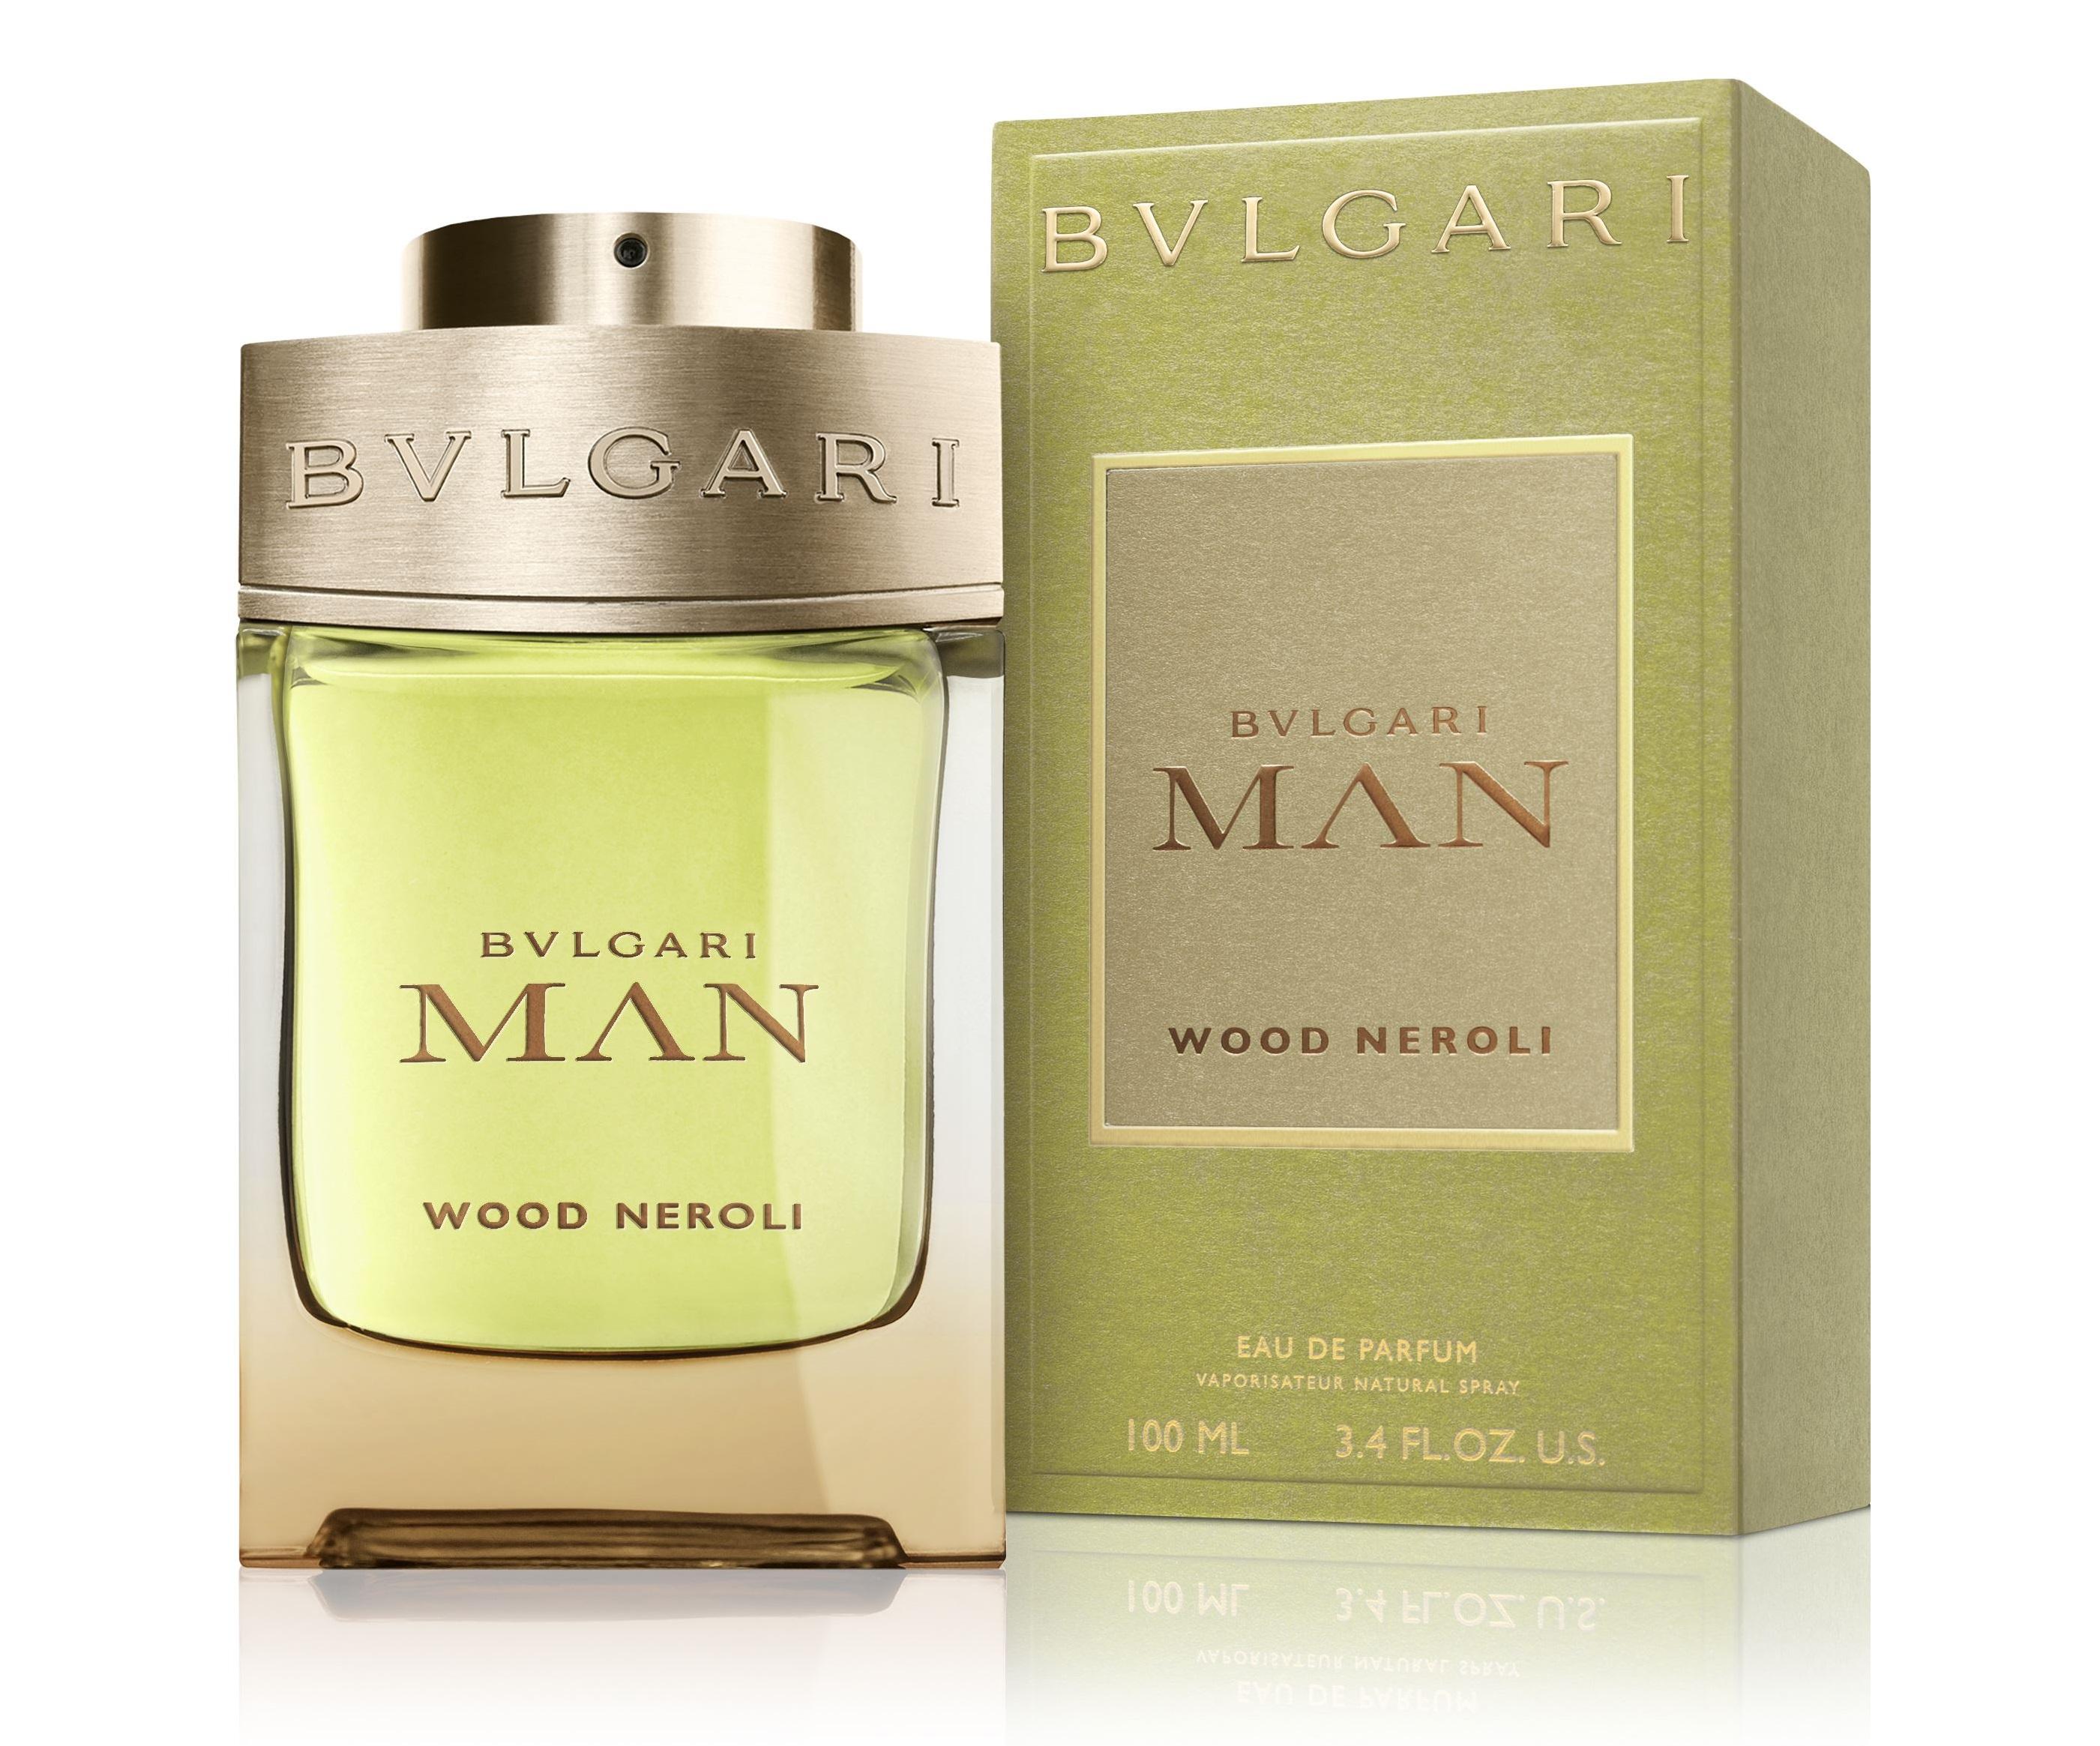 Bvlgari Man Wood Neroli (M)